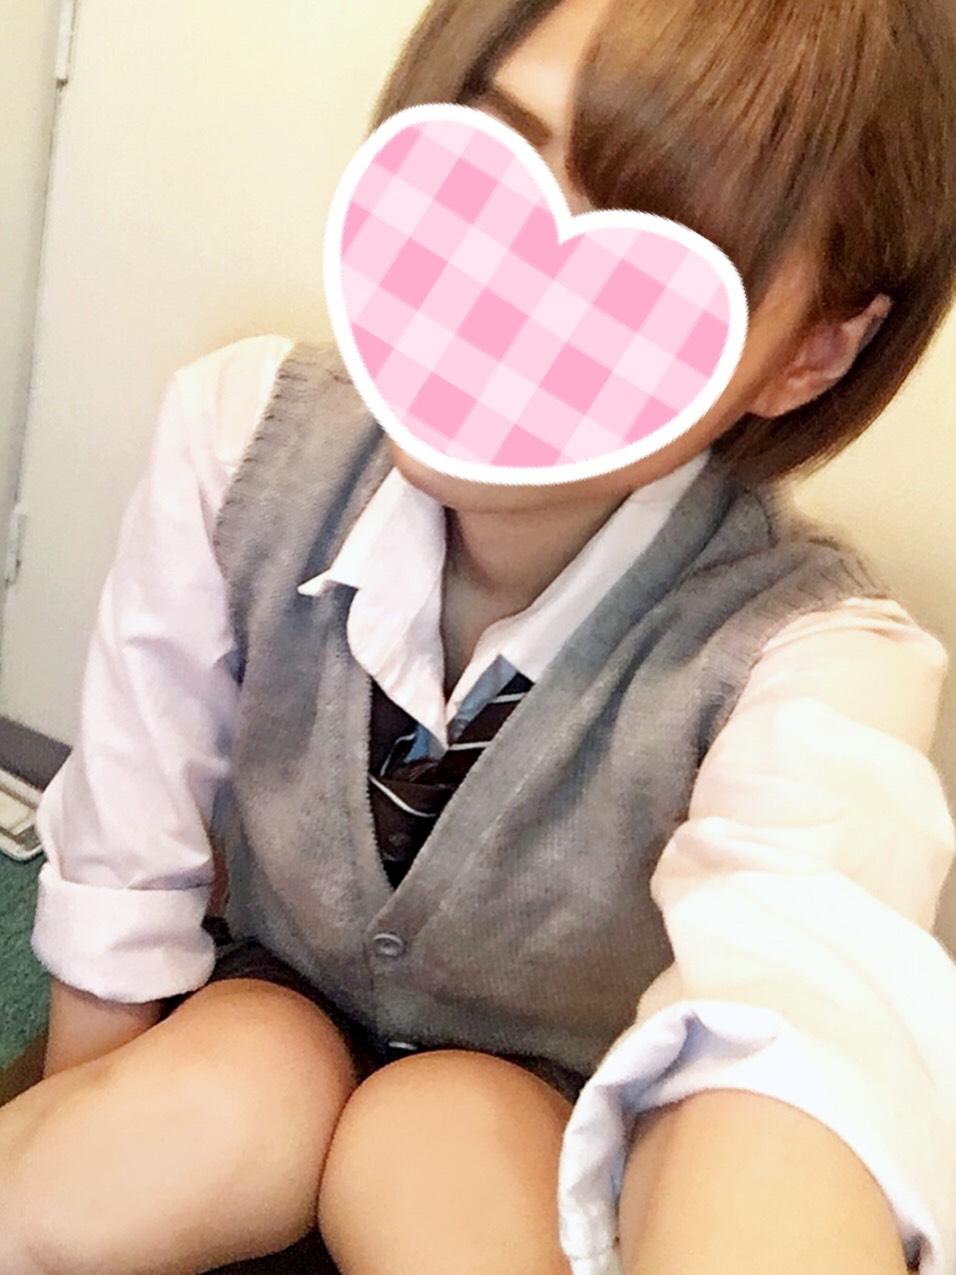 S__221159507